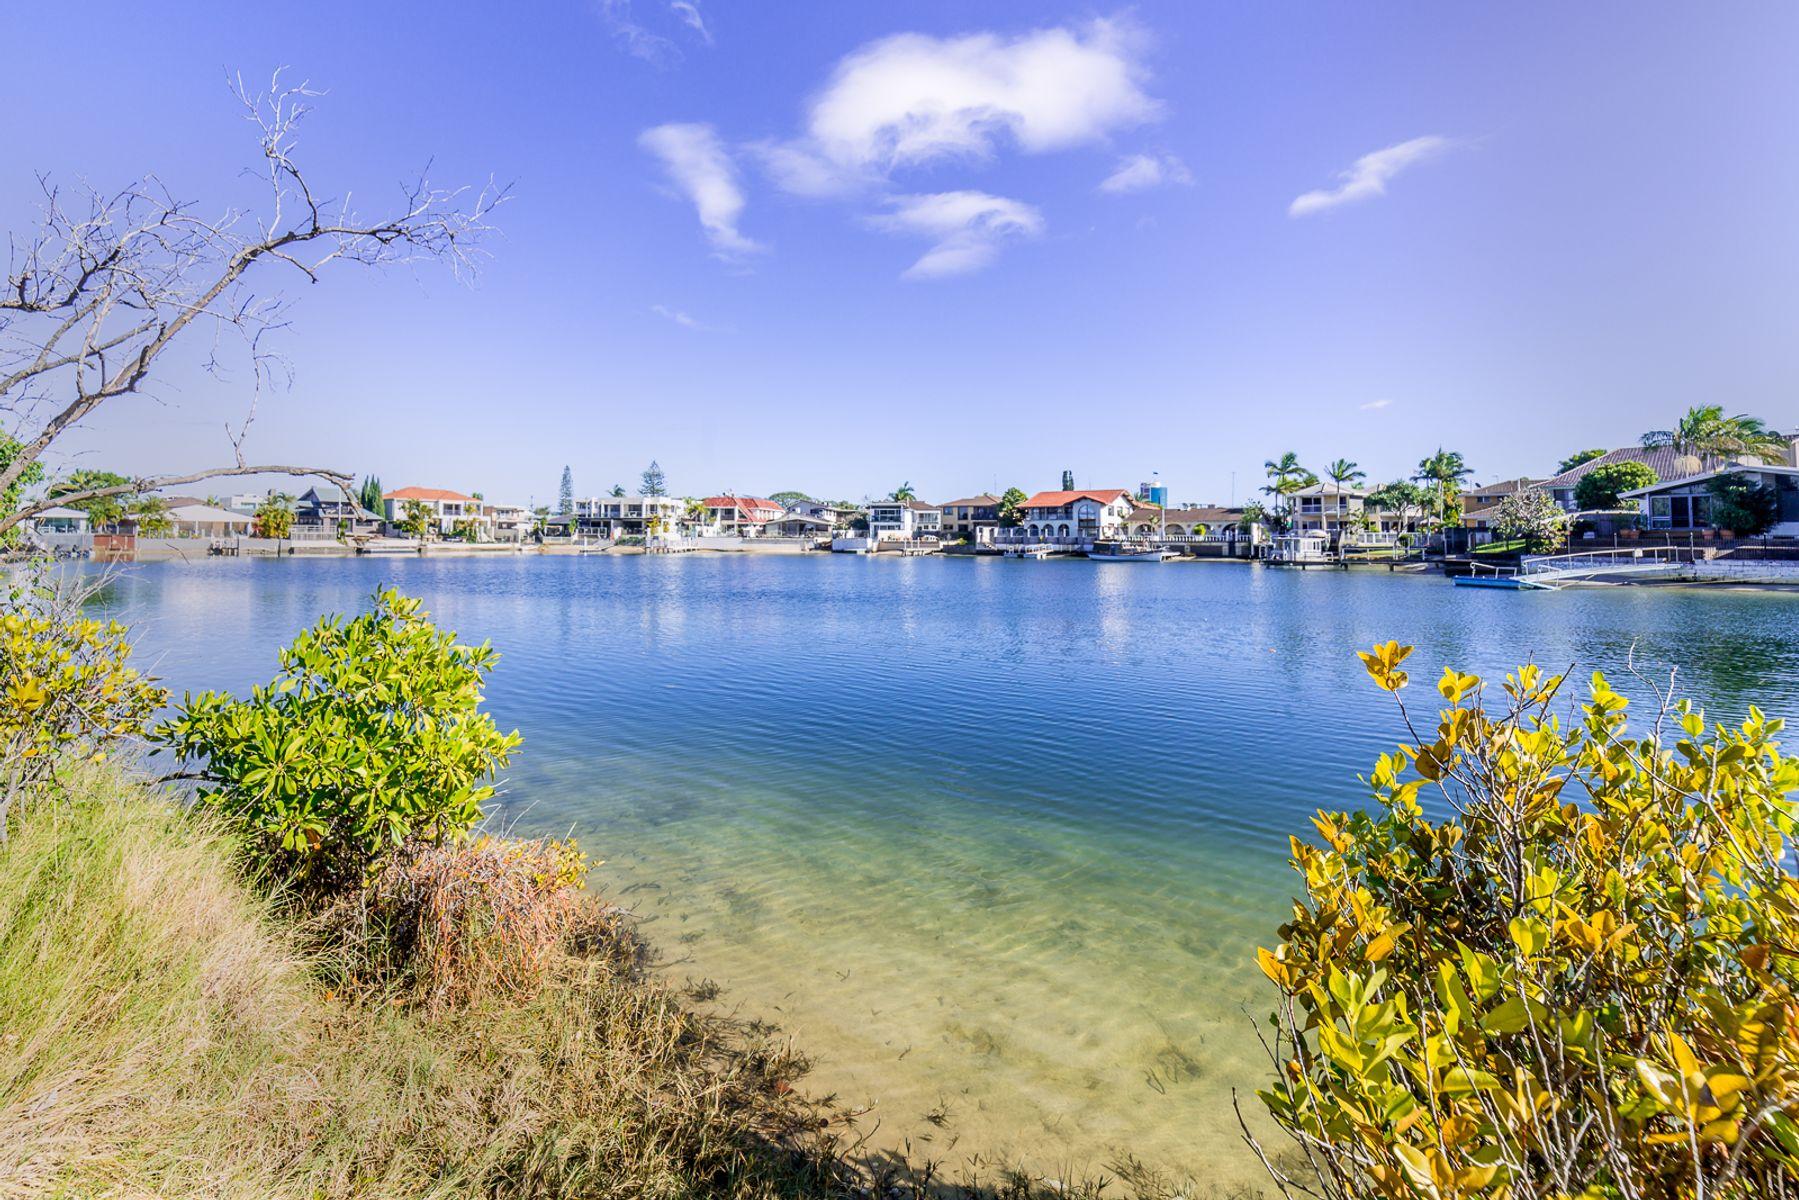 3/17 Watson Esplande, Surfers Paradise, QLD 4217